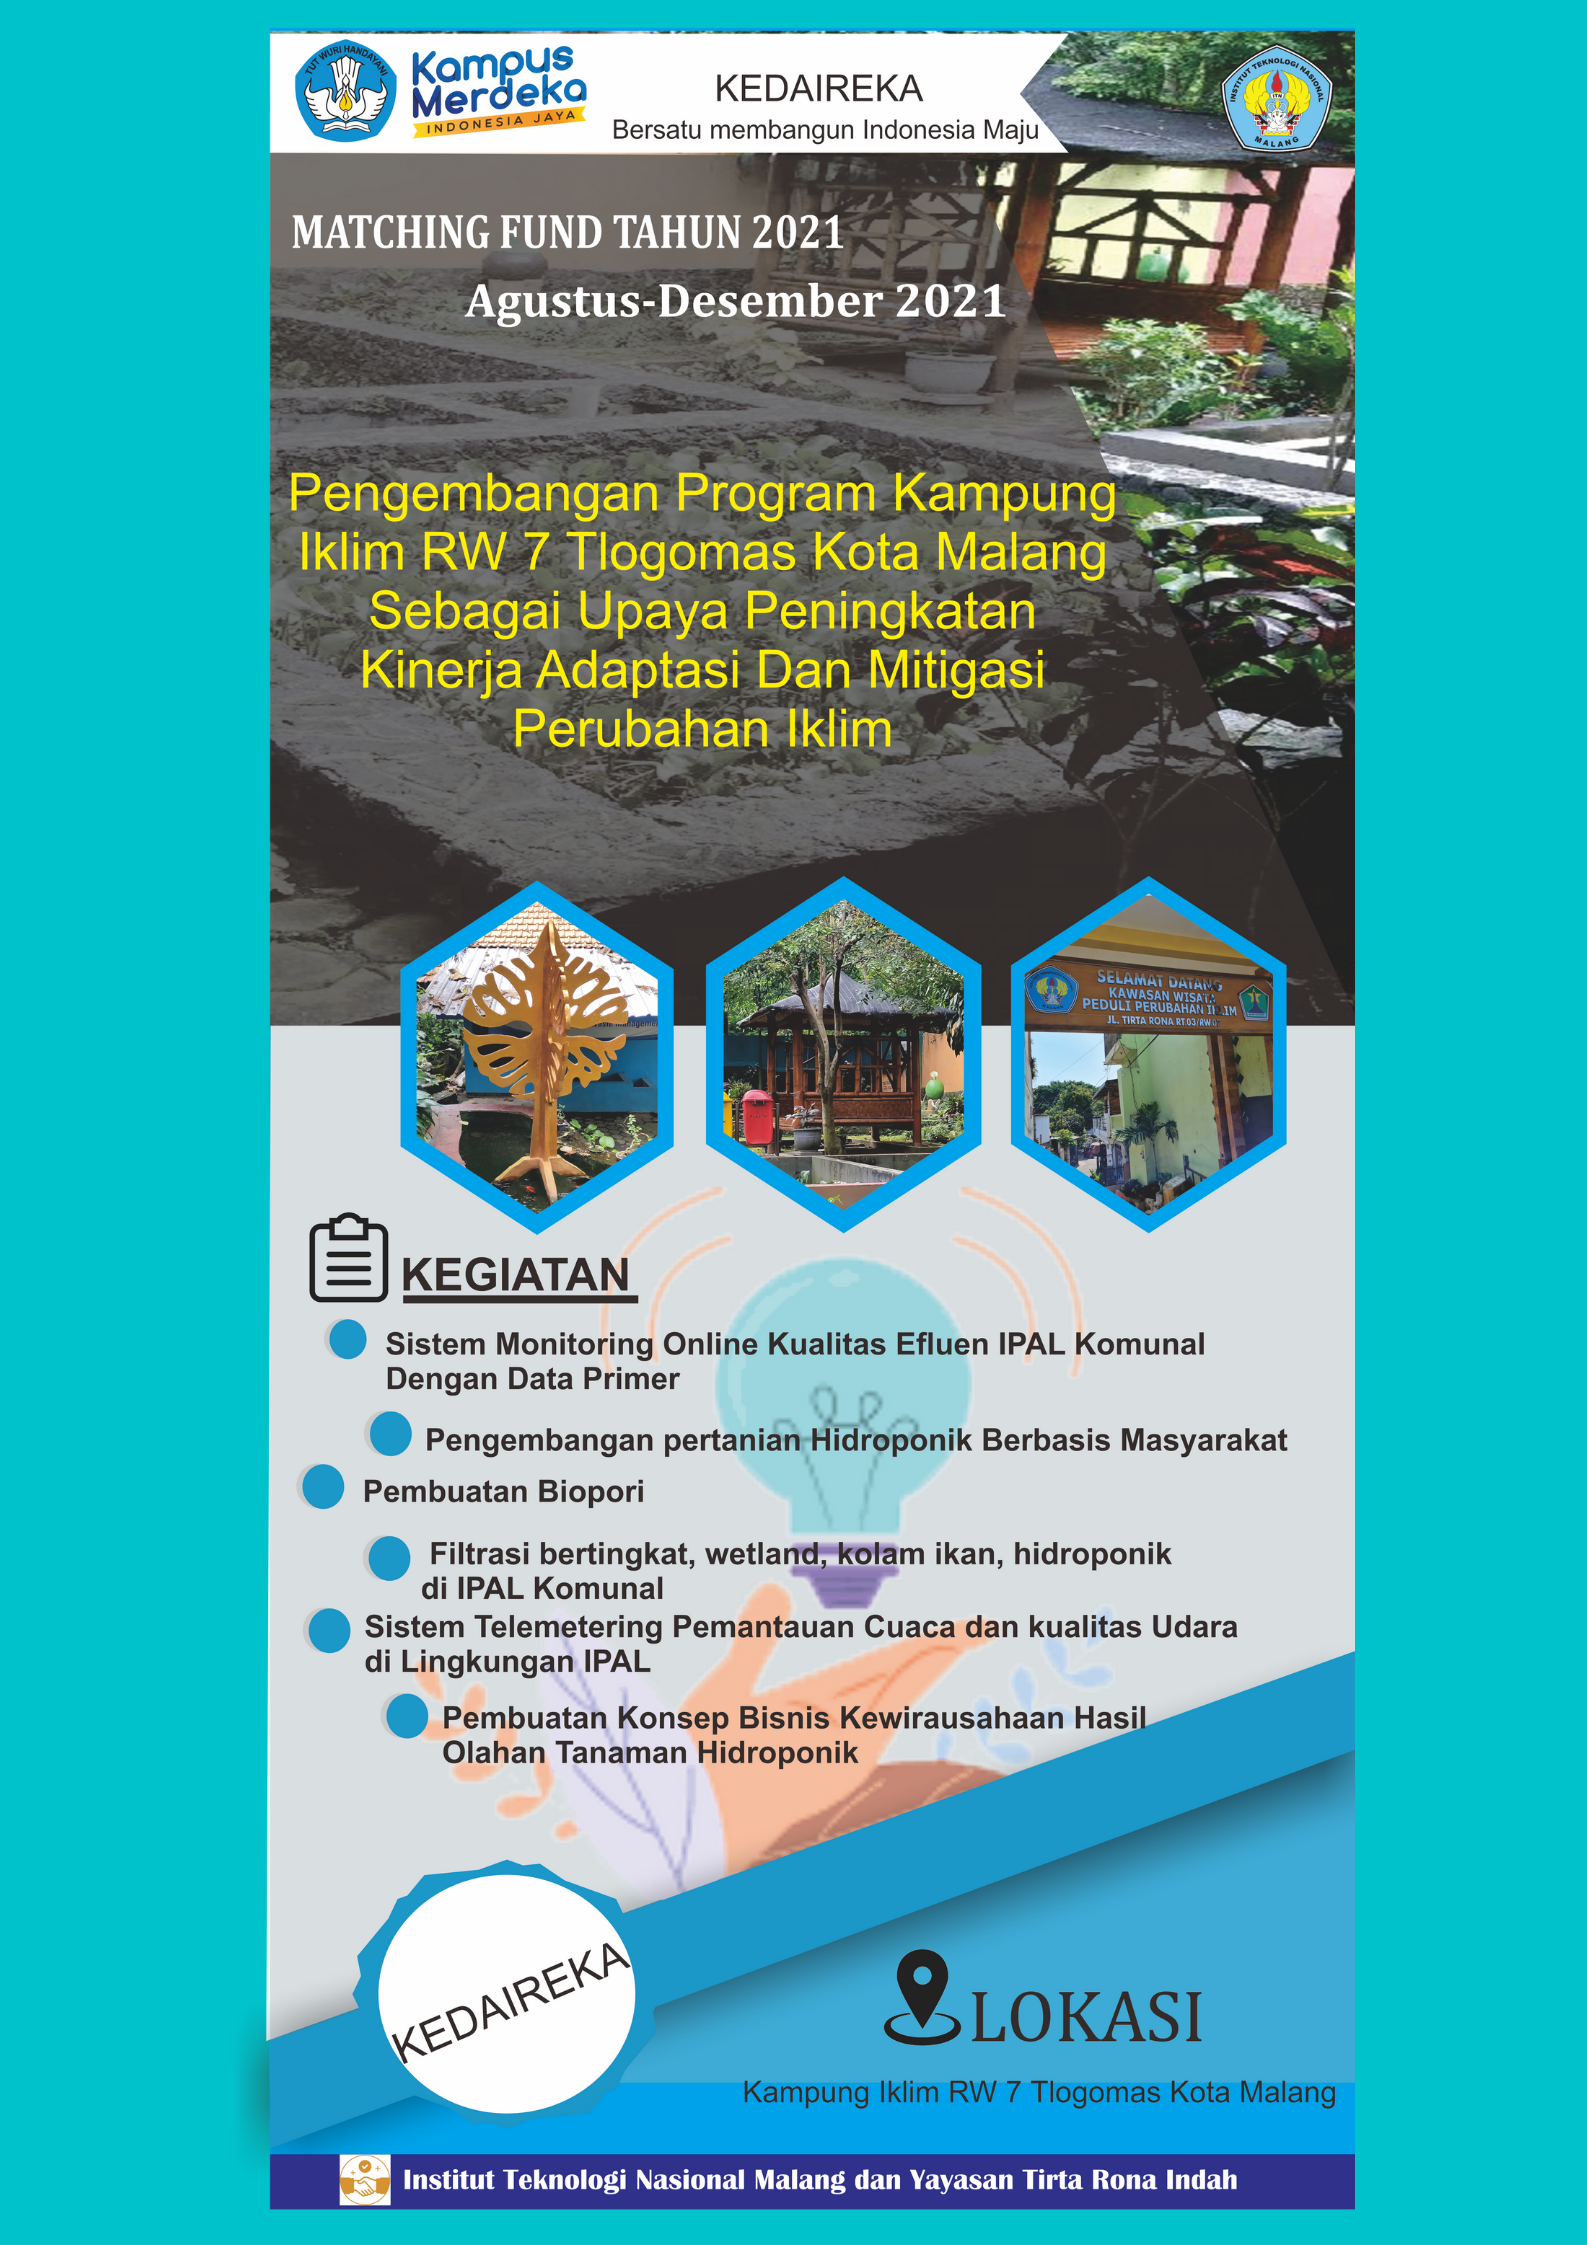 MBKM Magang 2021 -Matching Fund Tirtarona